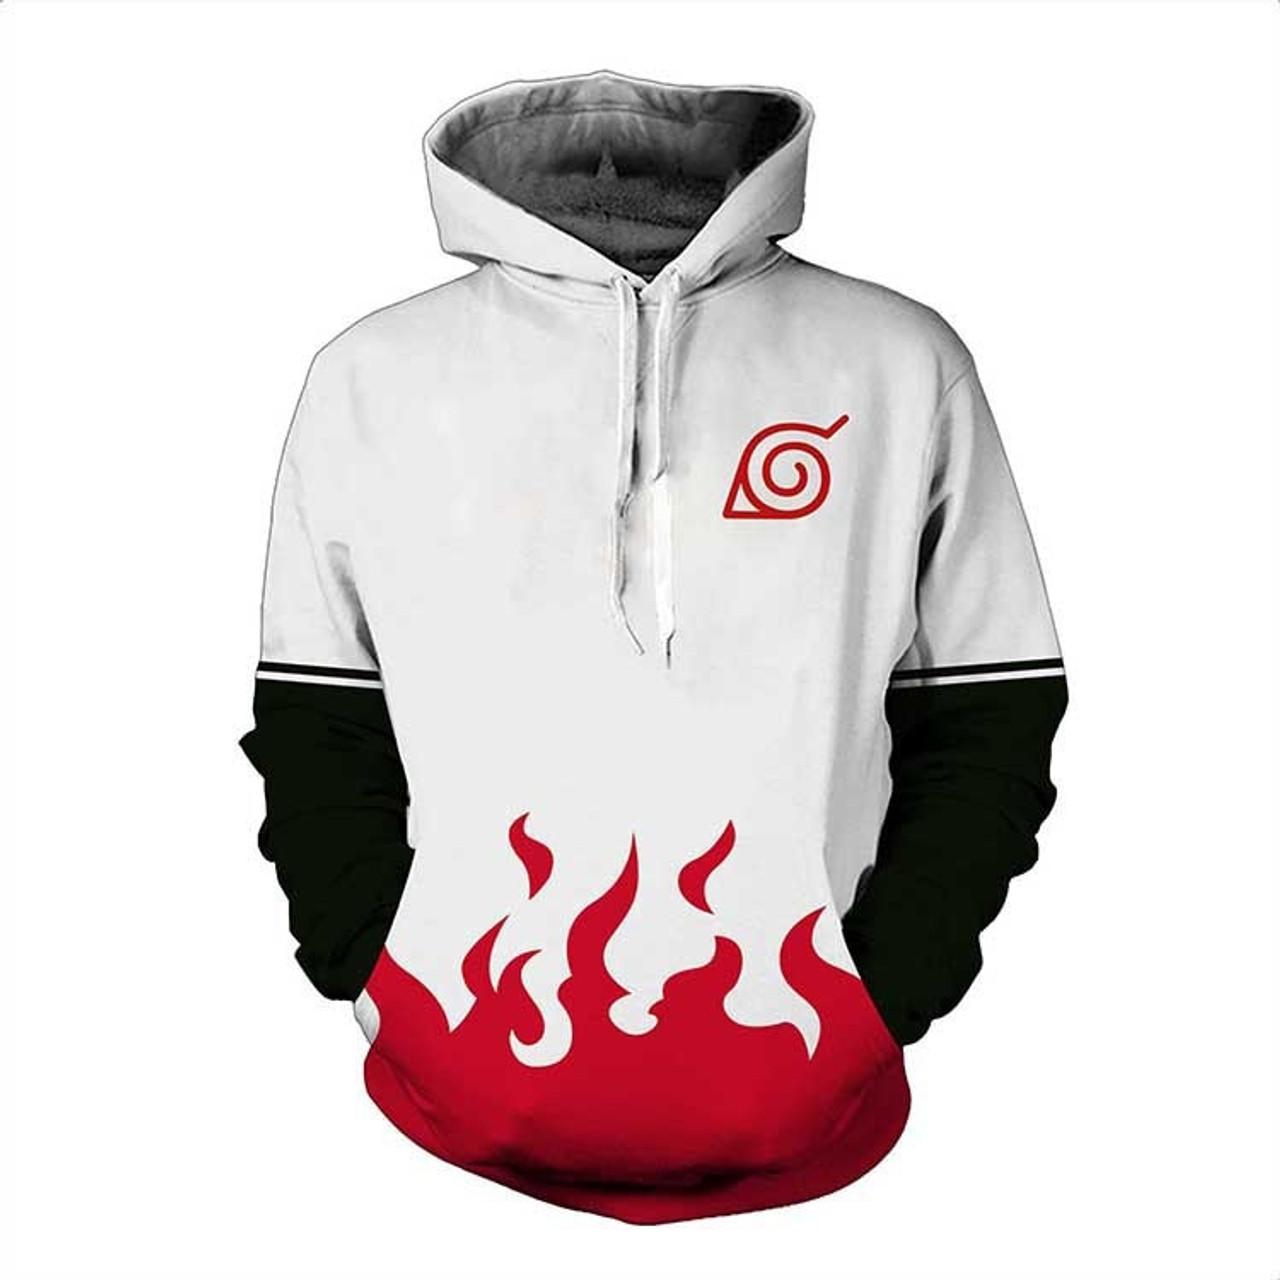 ... Naruto Hoodie Coat Sweatshirts Kakashi Akatsuki Sasuke O Brien 3D  Hoodies Pullovers Men Women Long ... d186005ae